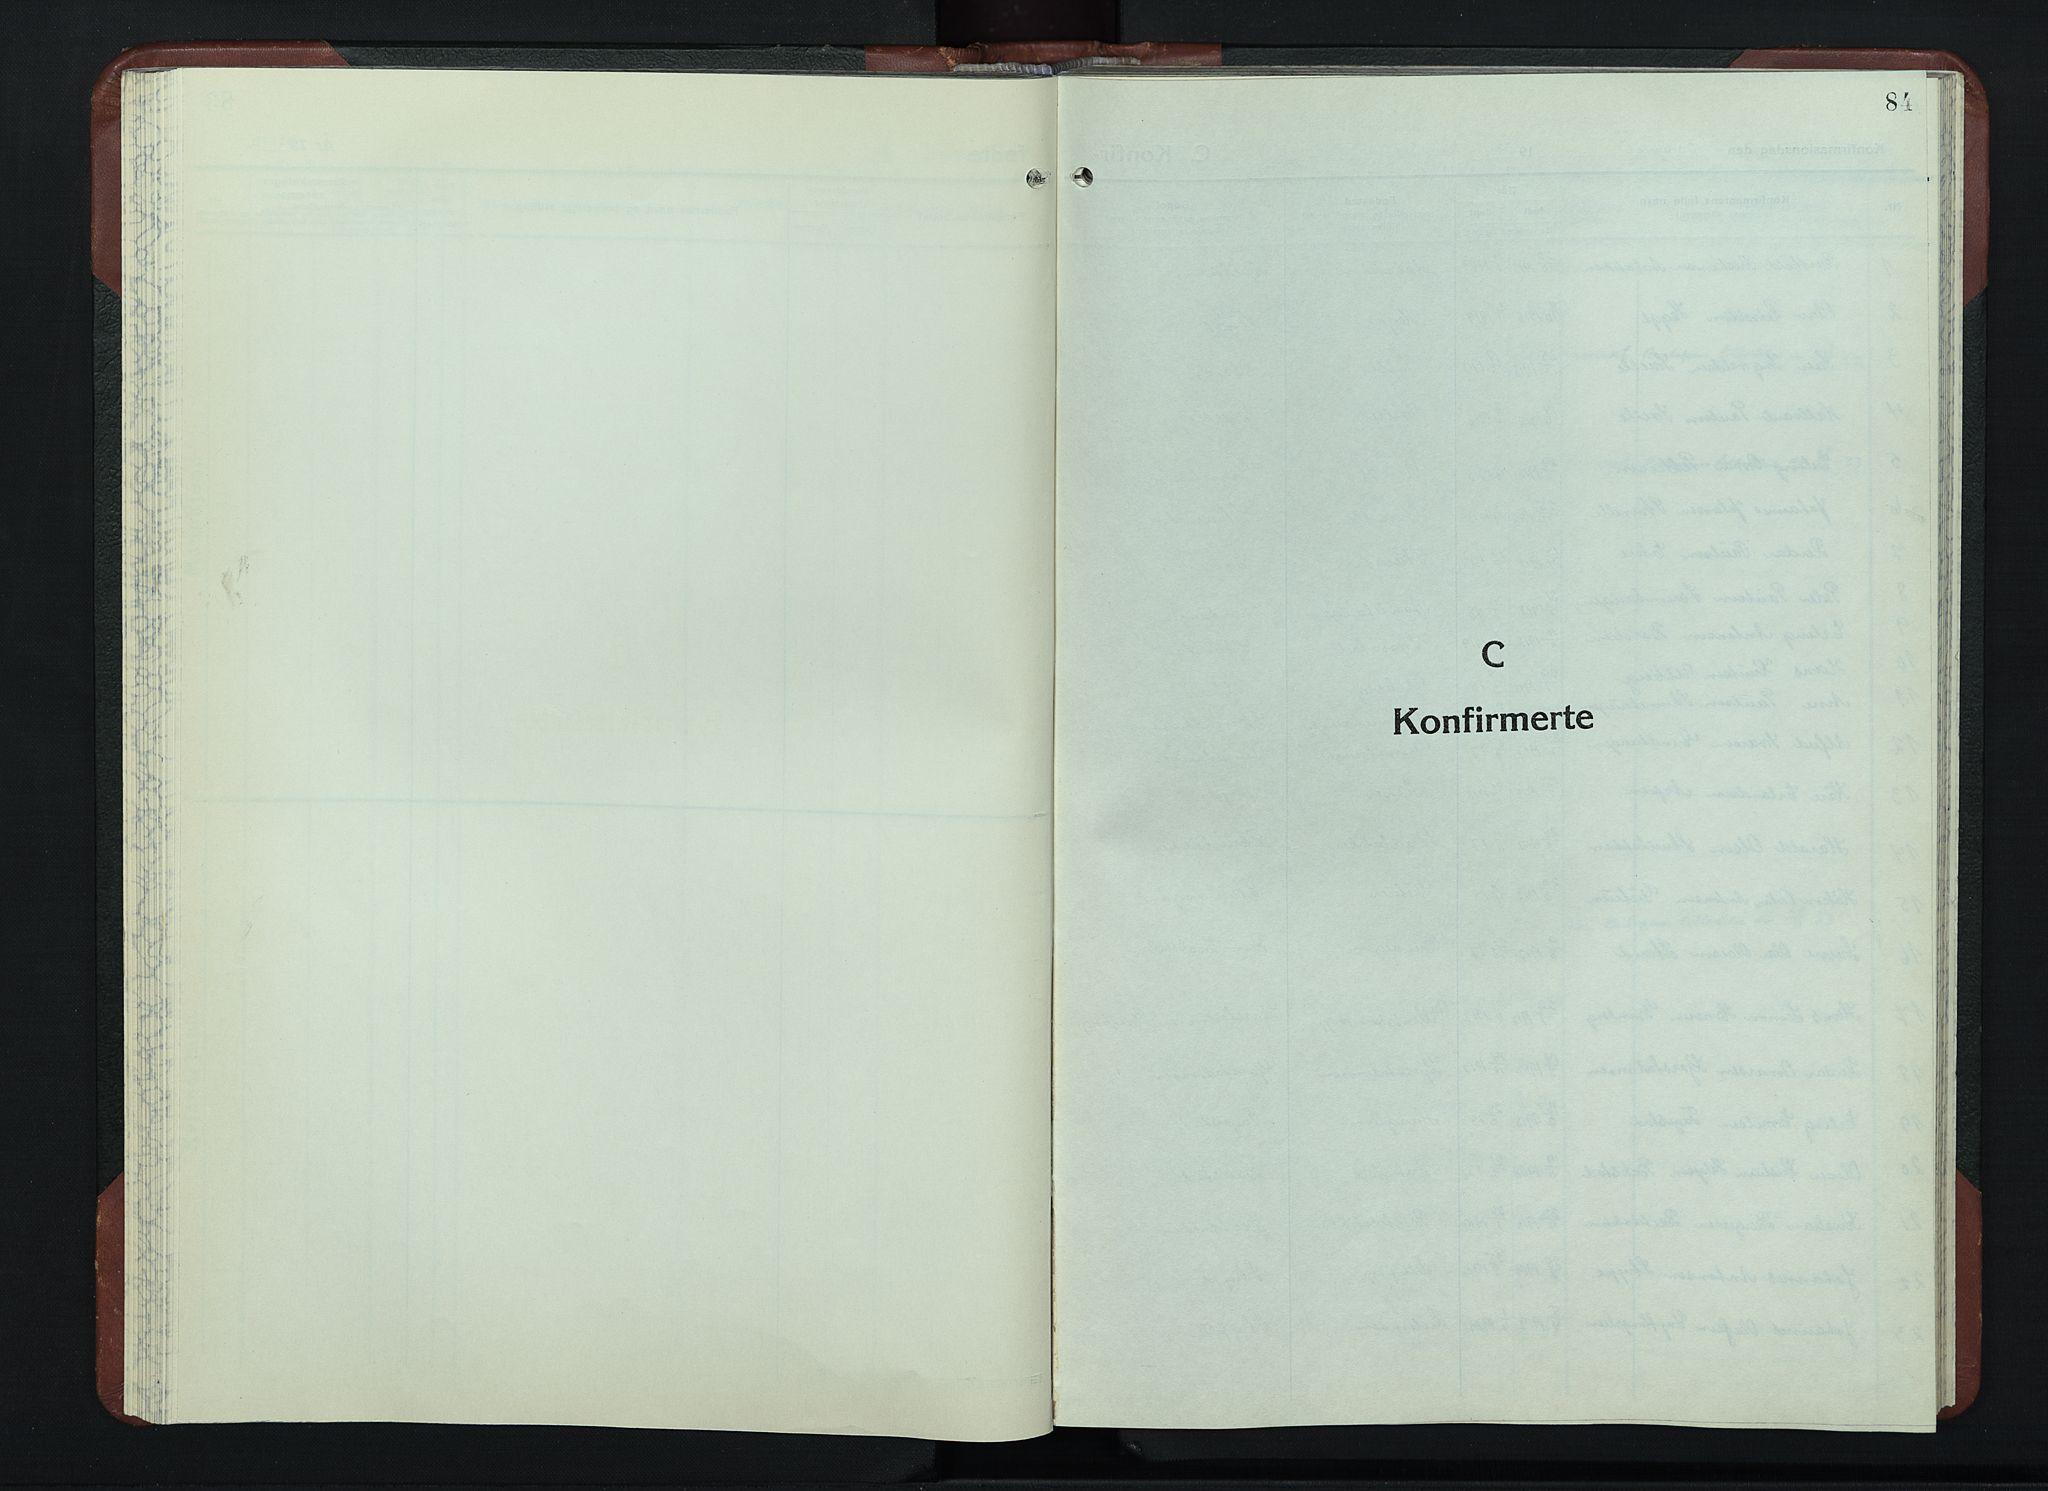 SAH, Sør-Fron prestekontor, H/Ha/Hab/L0006: Klokkerbok nr. 6, 1933-1948, s. 84